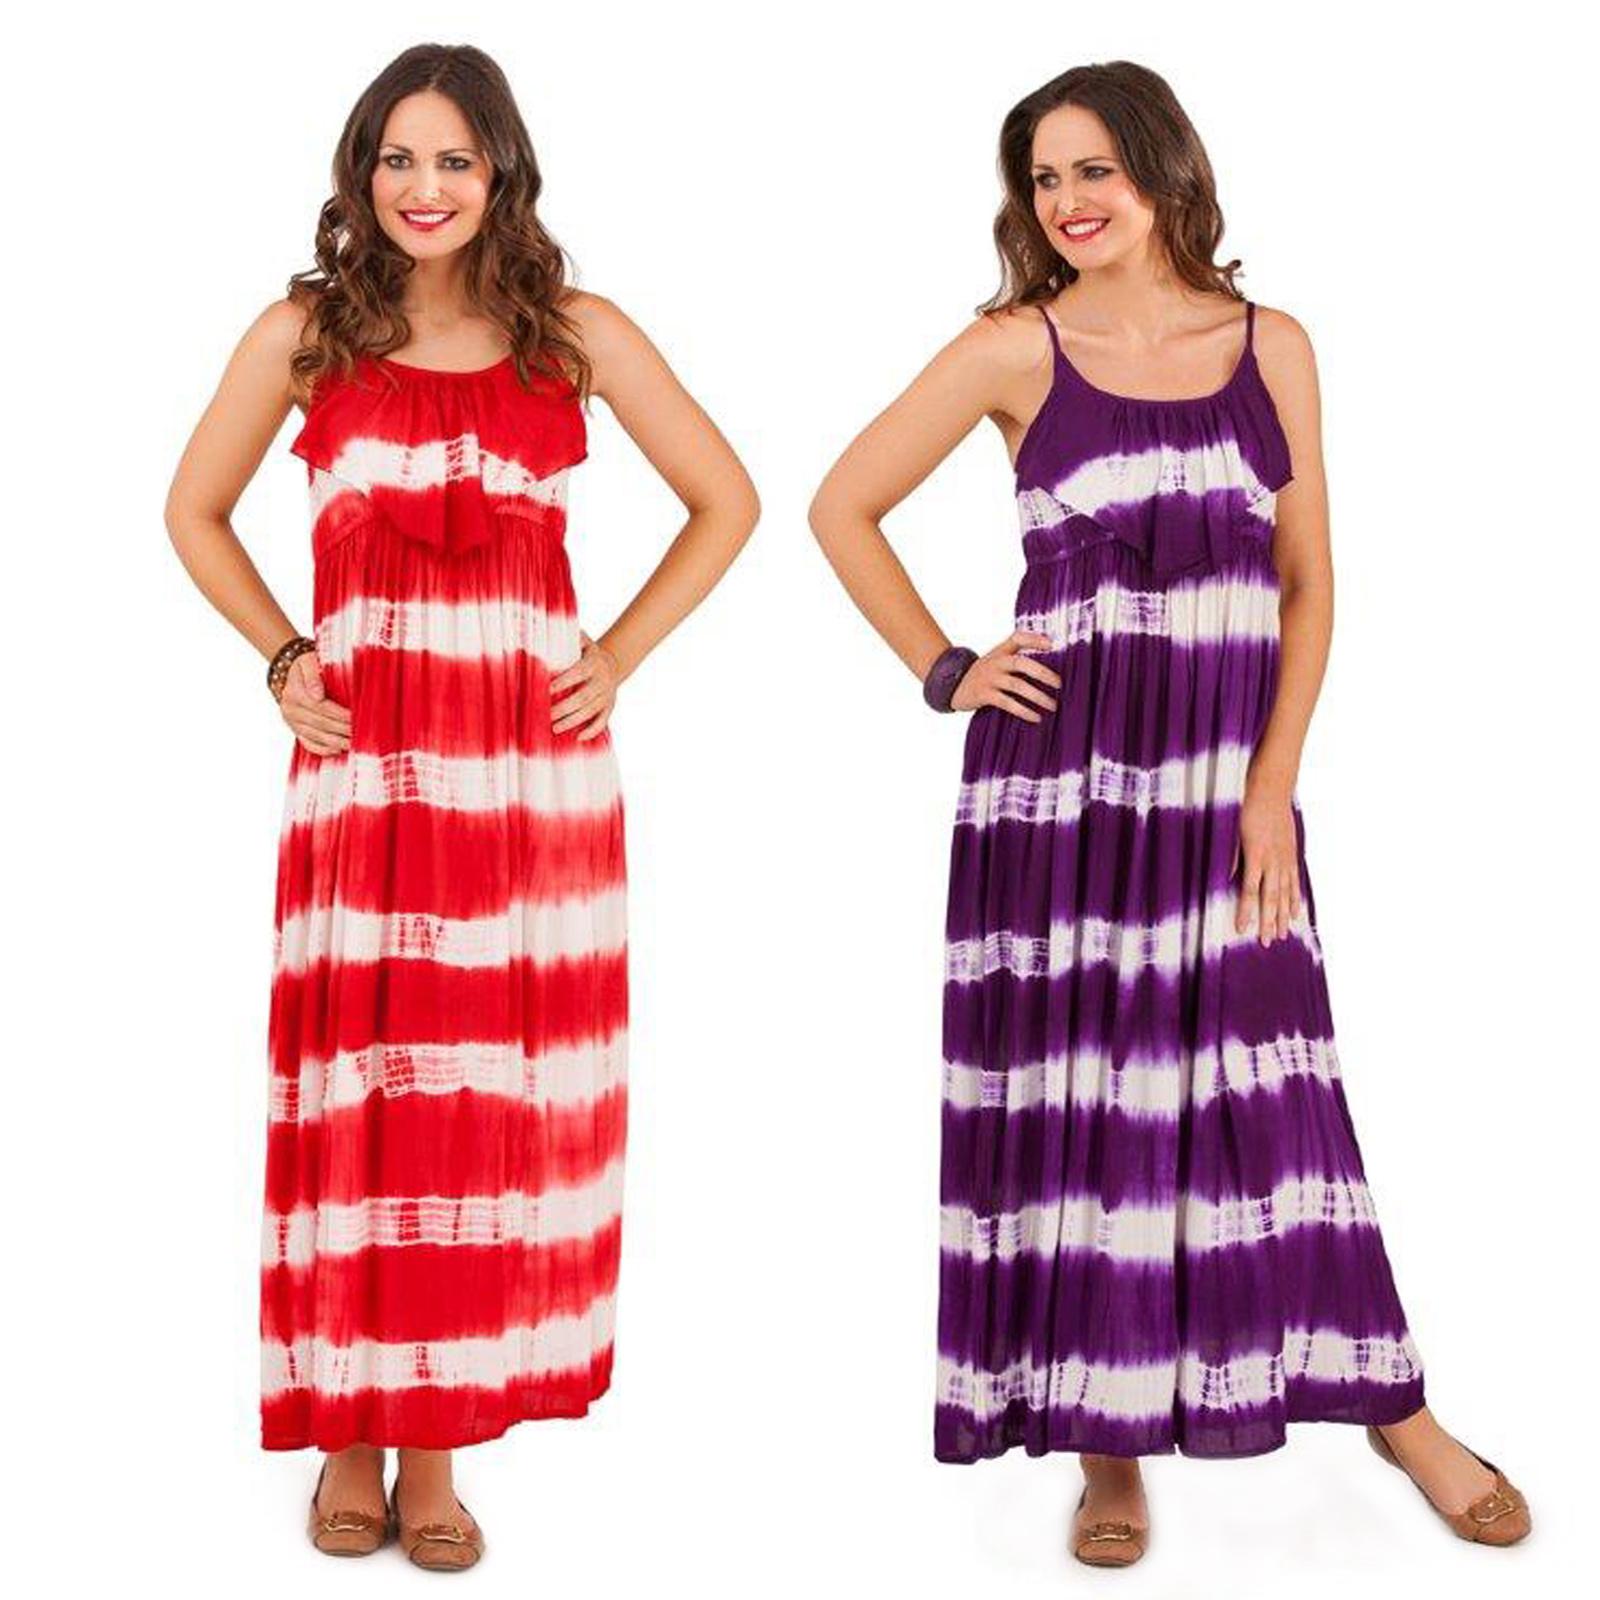 Pistachio Womens Tie Dye Sleeveless Maxi Or New Ladies Summer Beach Swing Dress